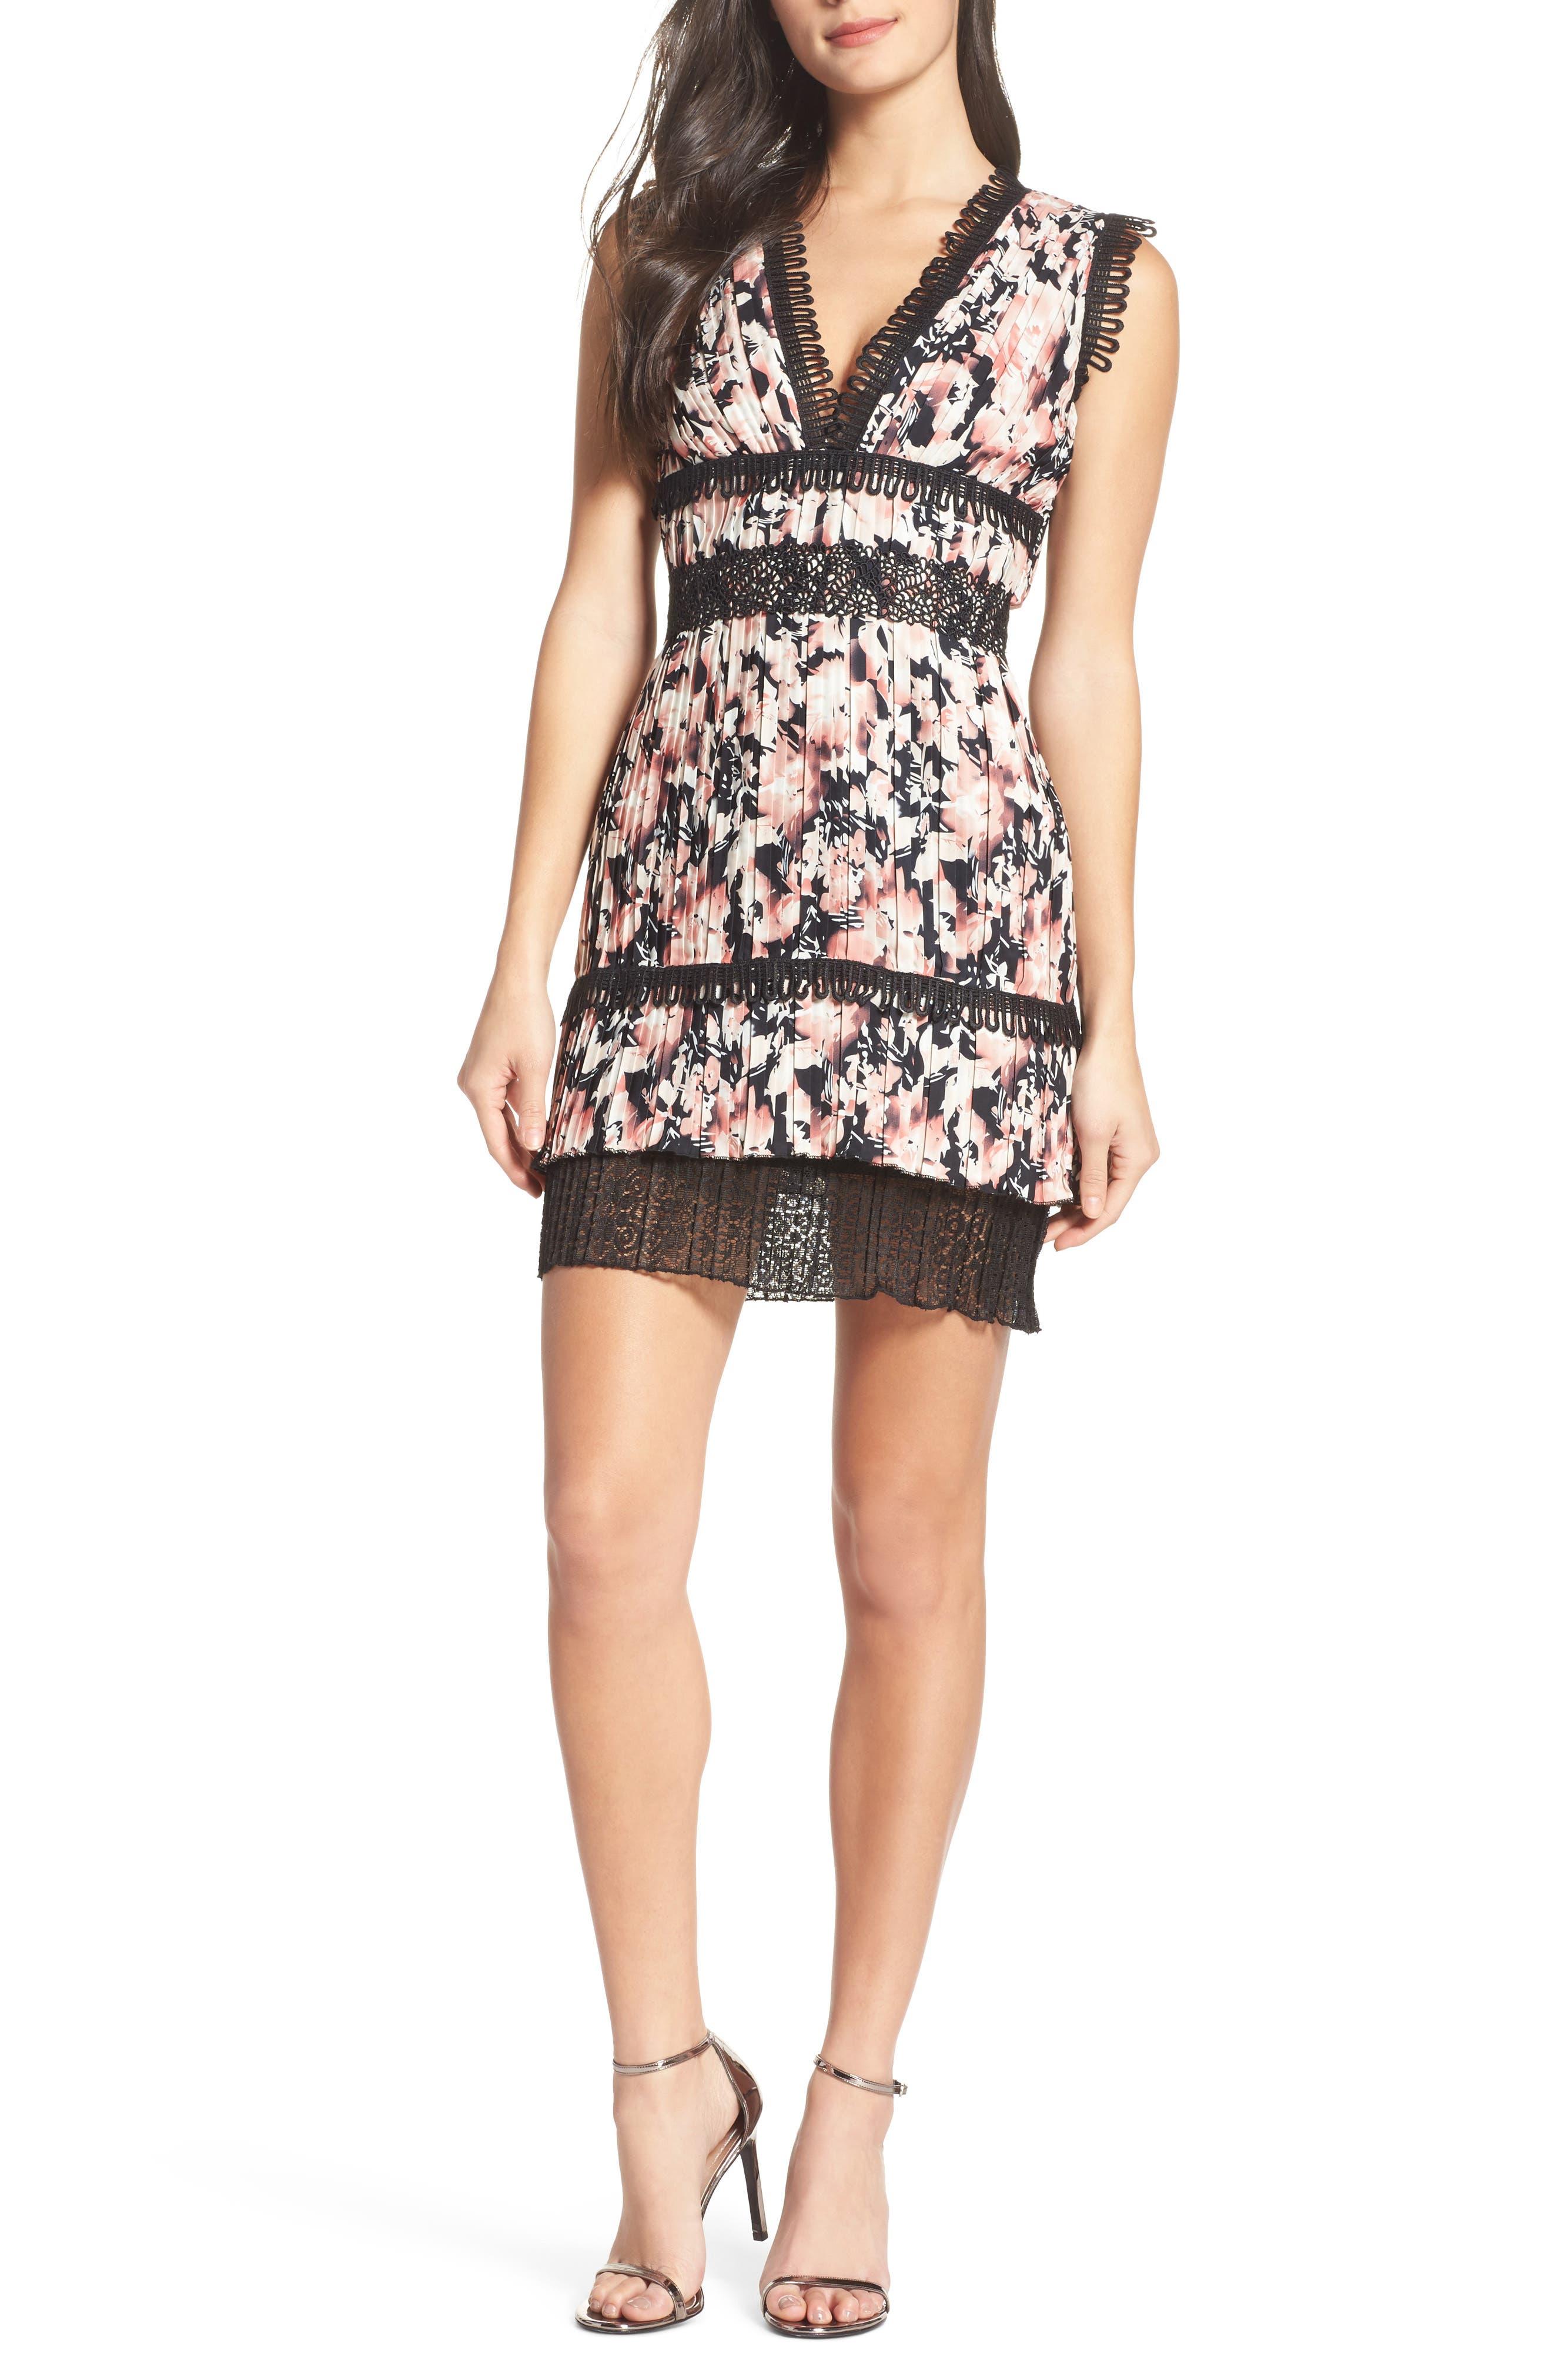 Main Image - Foxiedox Jasmine Floral Pleated Fit & Flare Dress